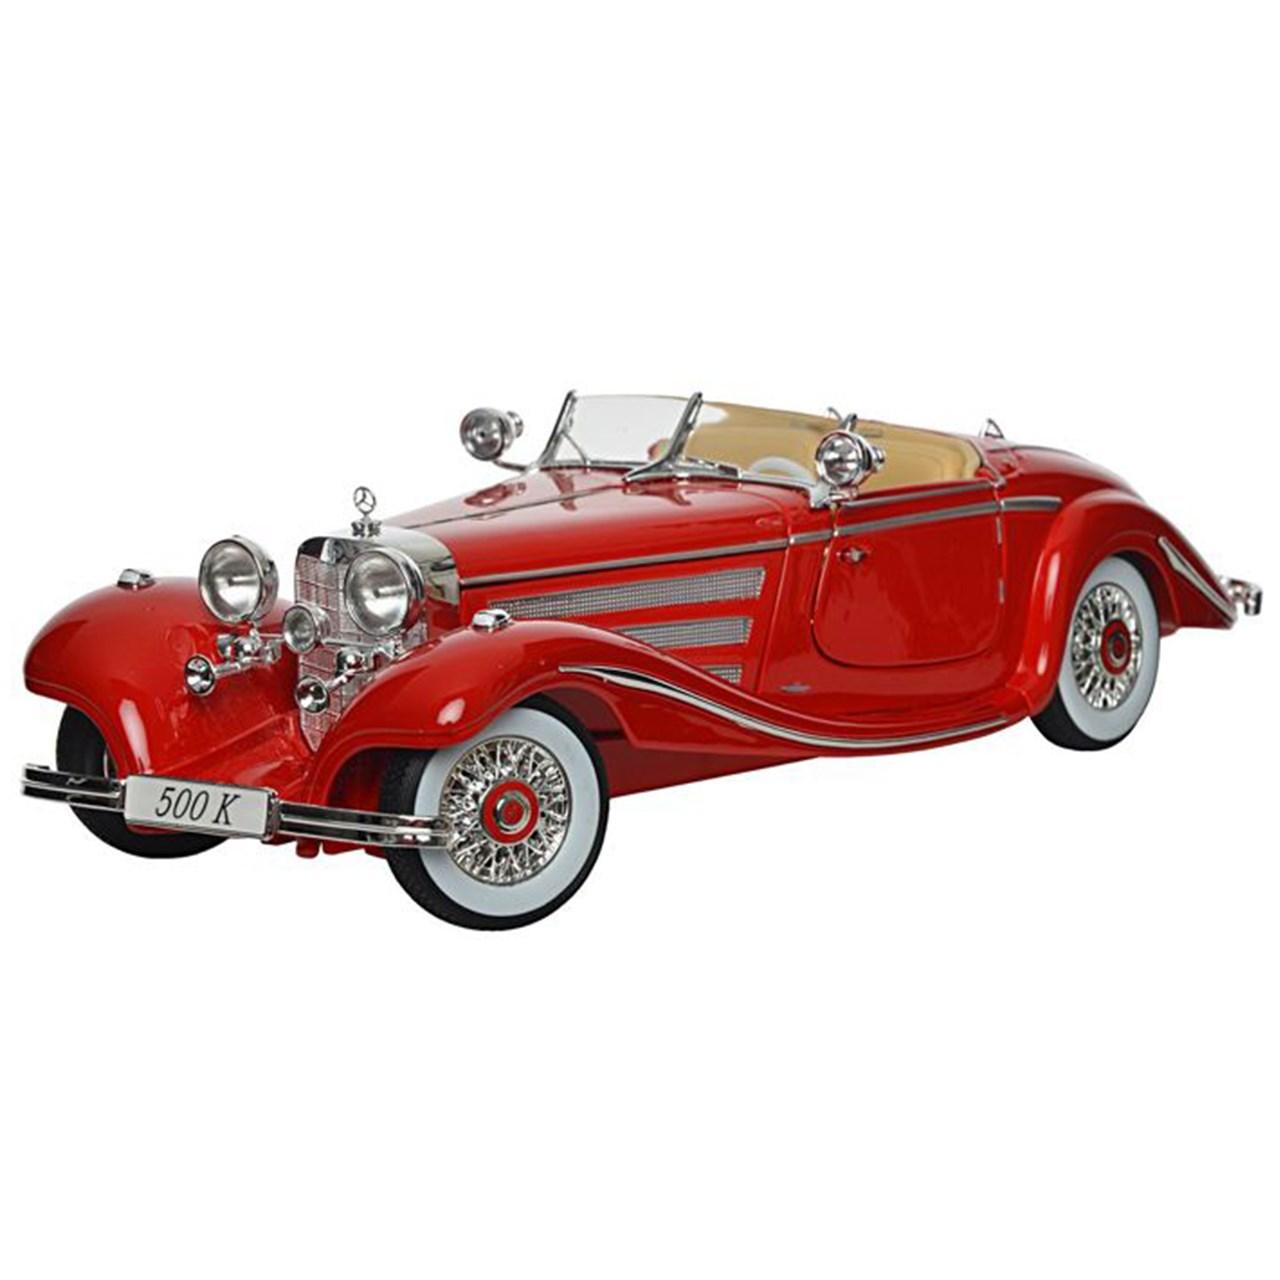 ماشین بازی مایستو مدل Mercedes Benz 500K Type Specialroadster 1936